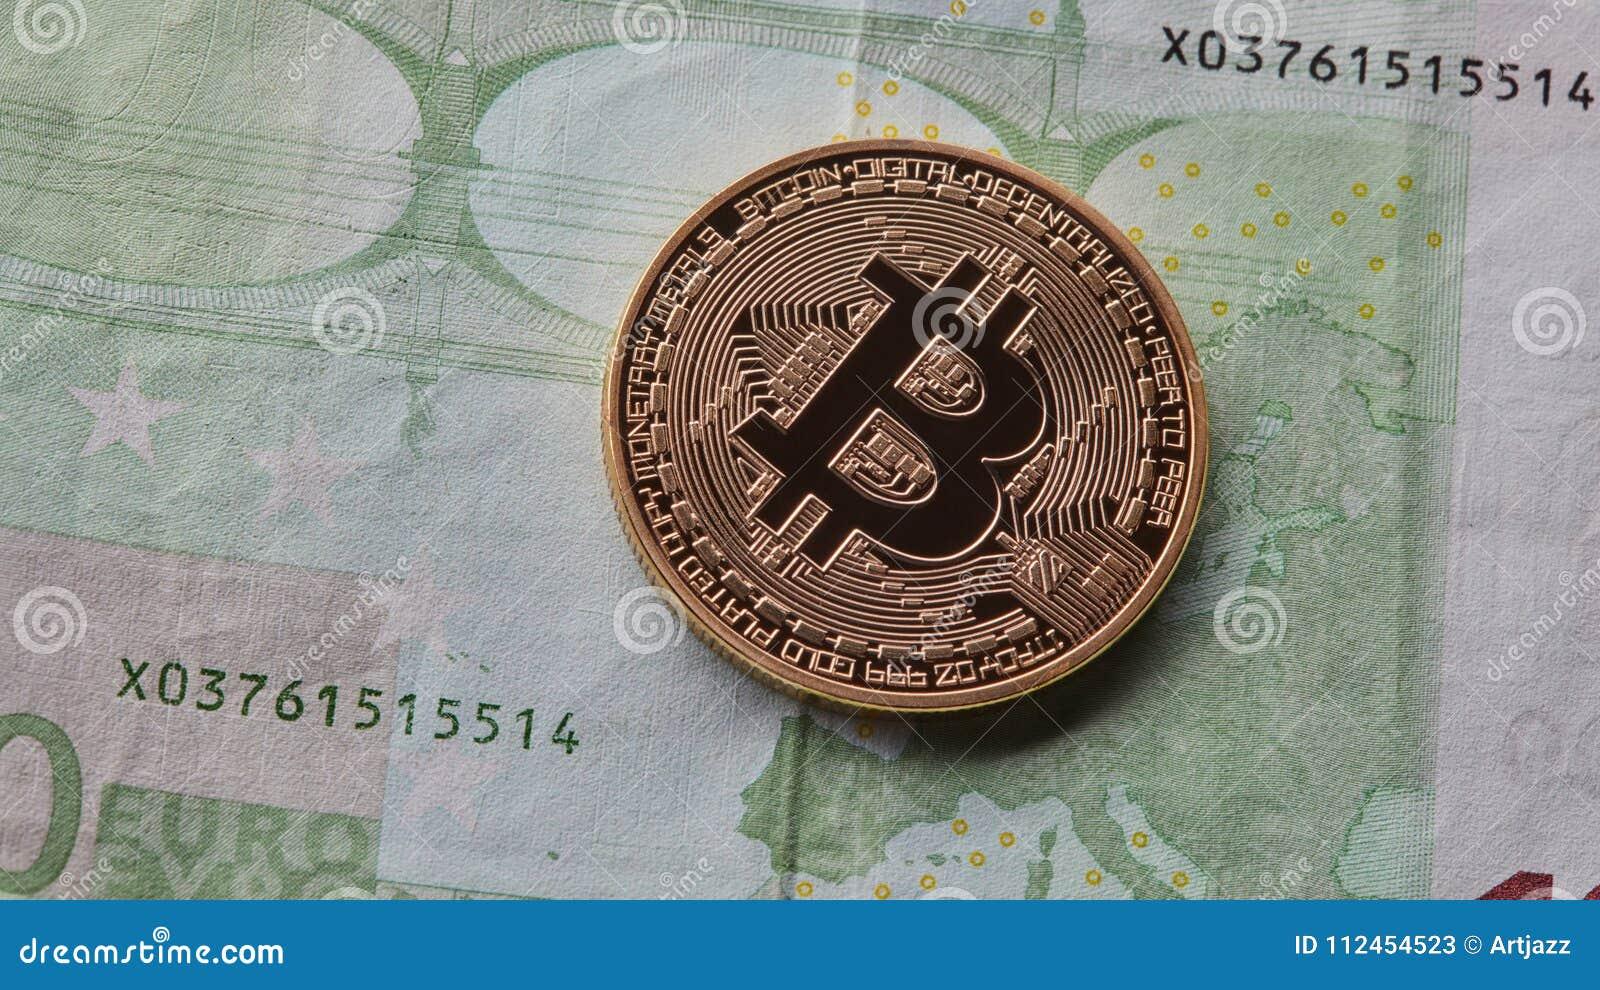 profit coin exchange